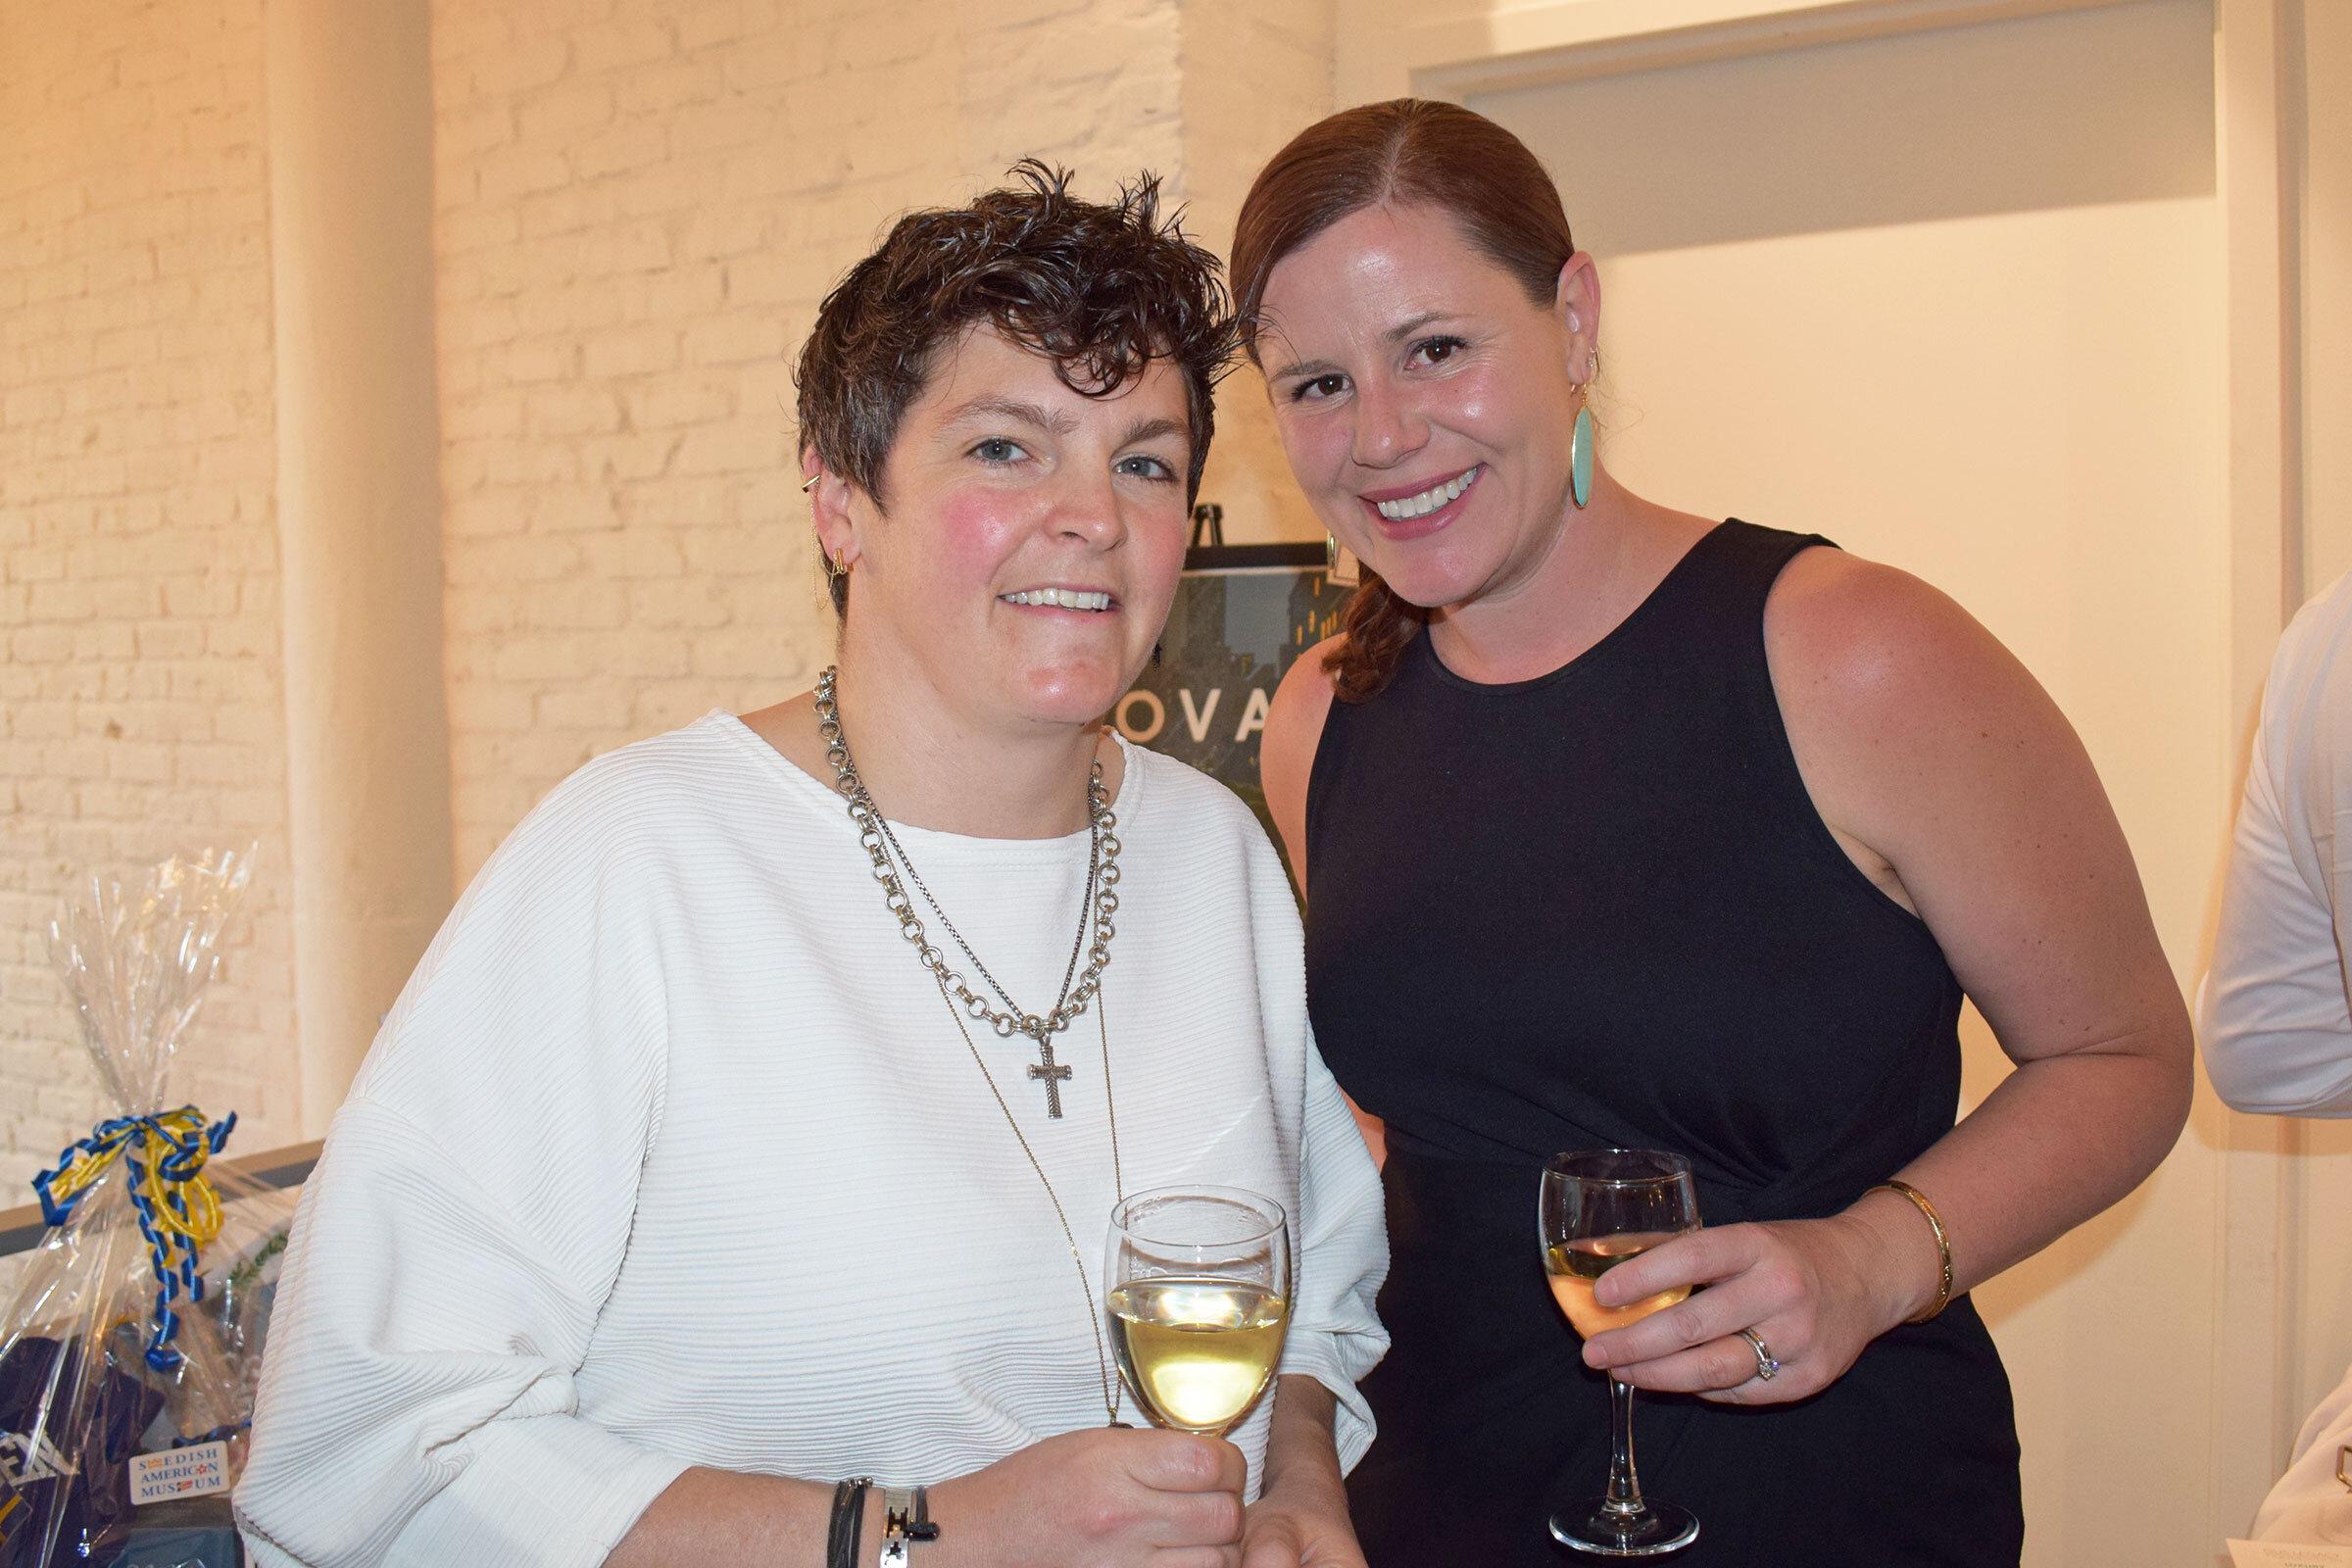 Krista Wortendyke & Mary Beck